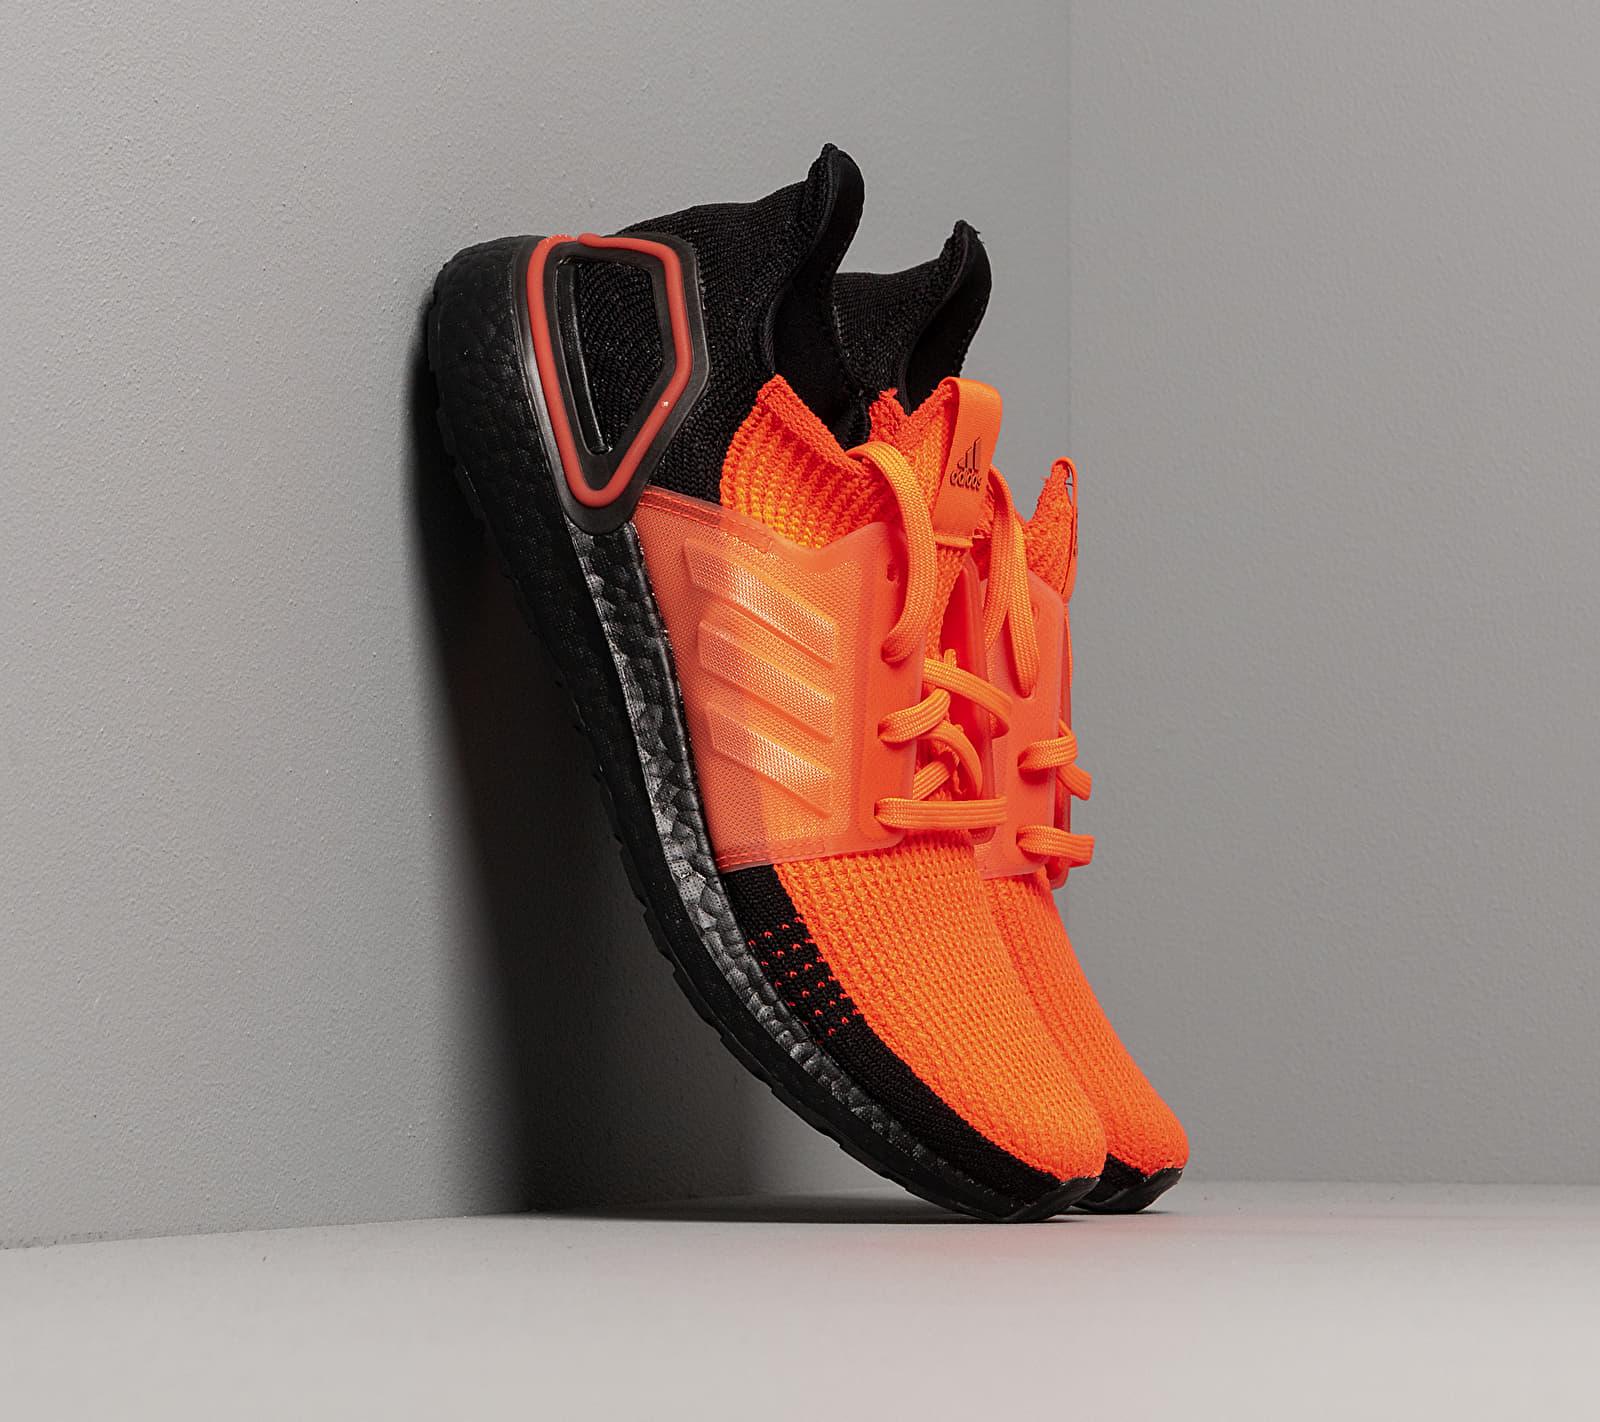 adidas UltraBOOST 19 M Solar Red/ Core Black/ Solar Red G27131